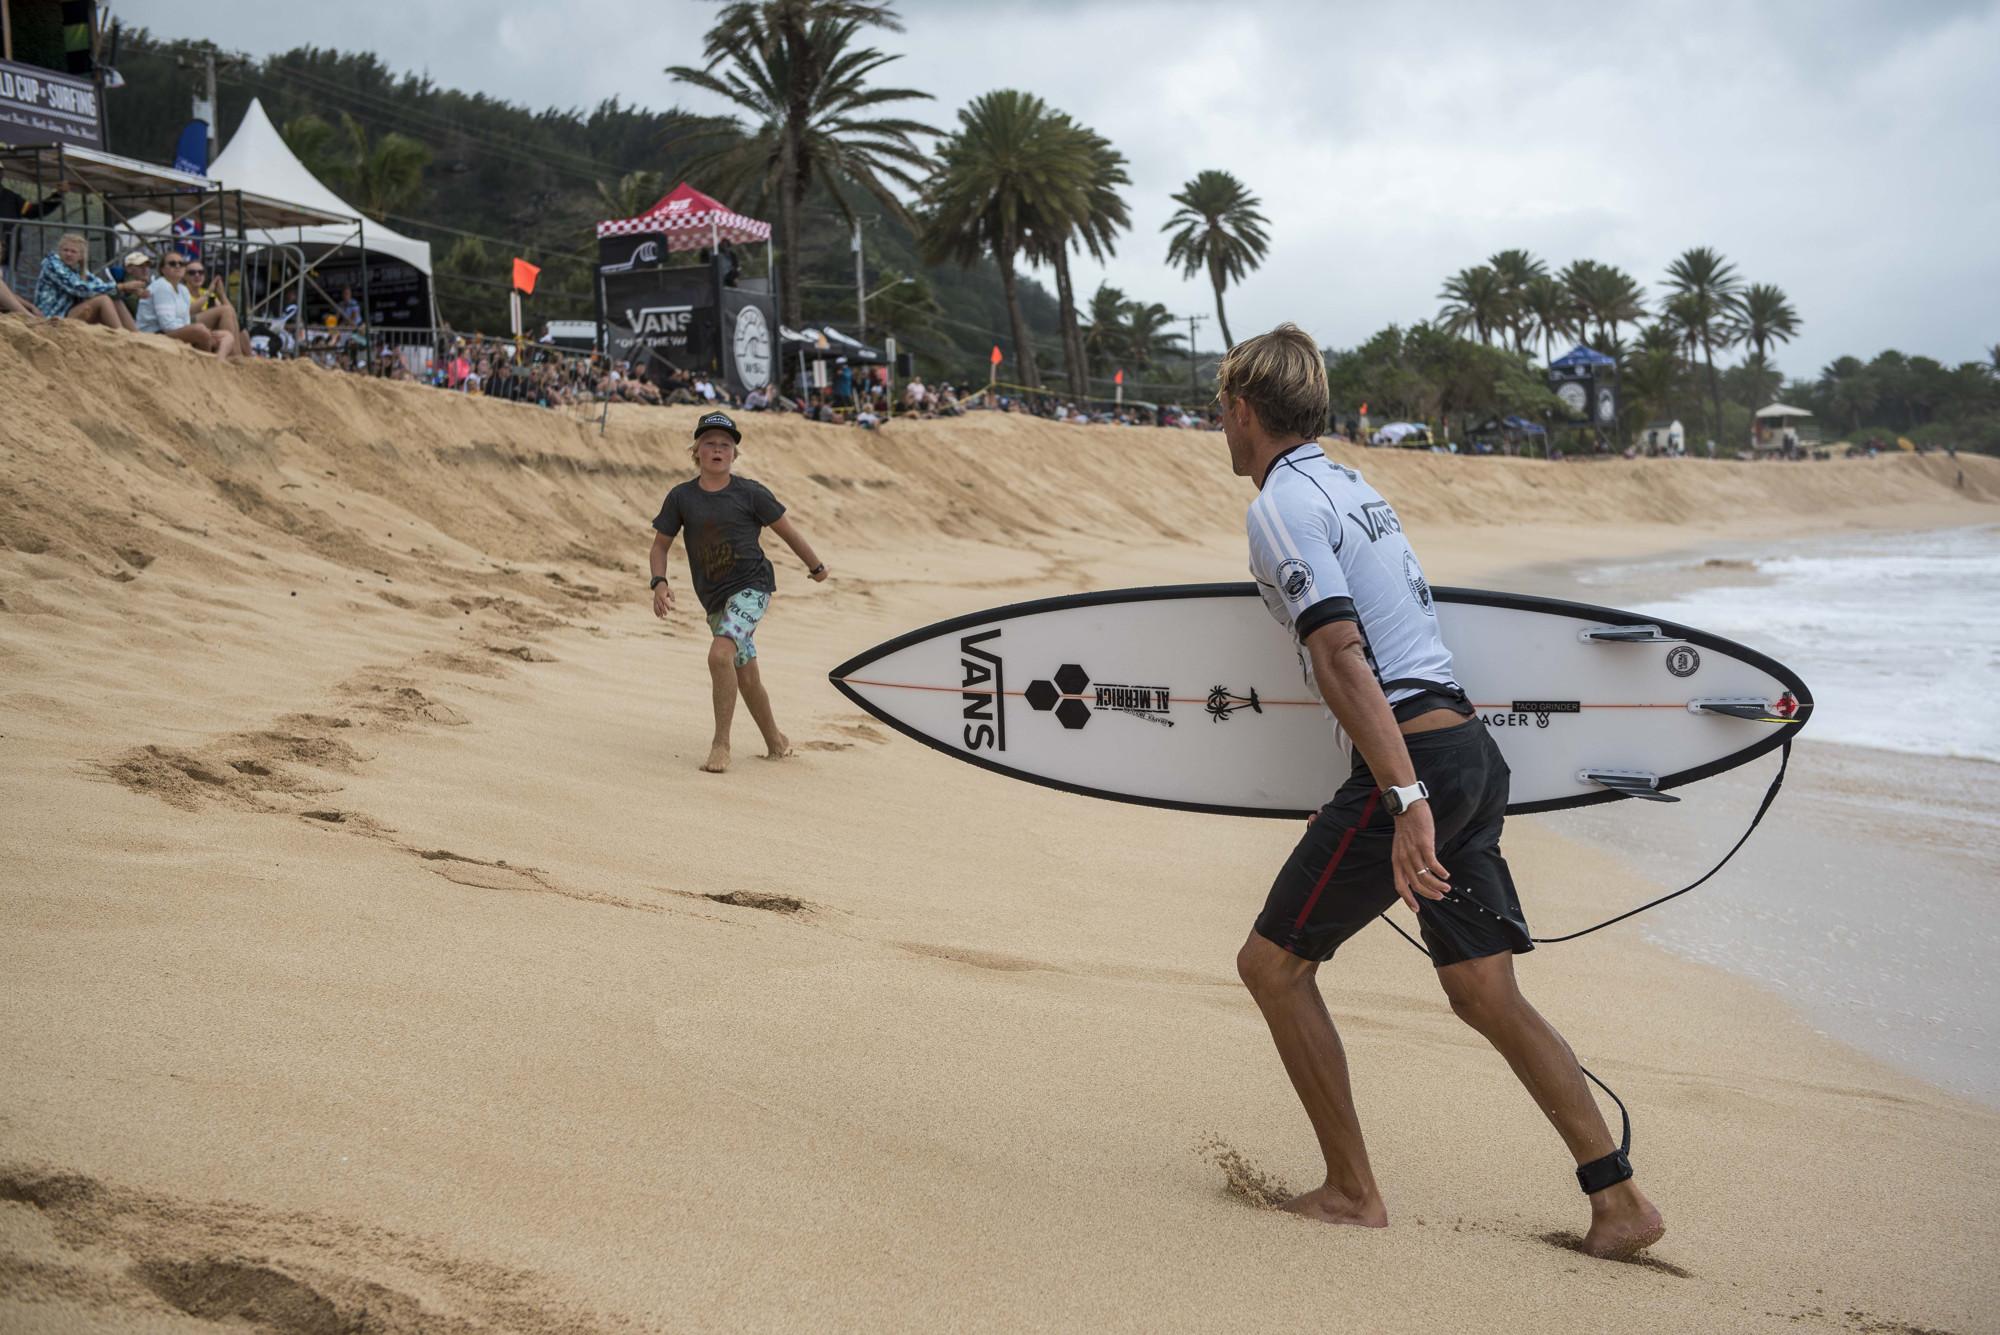 44d430325d Conner Coffin Wins Vans US Open - Surf Station Surf Report